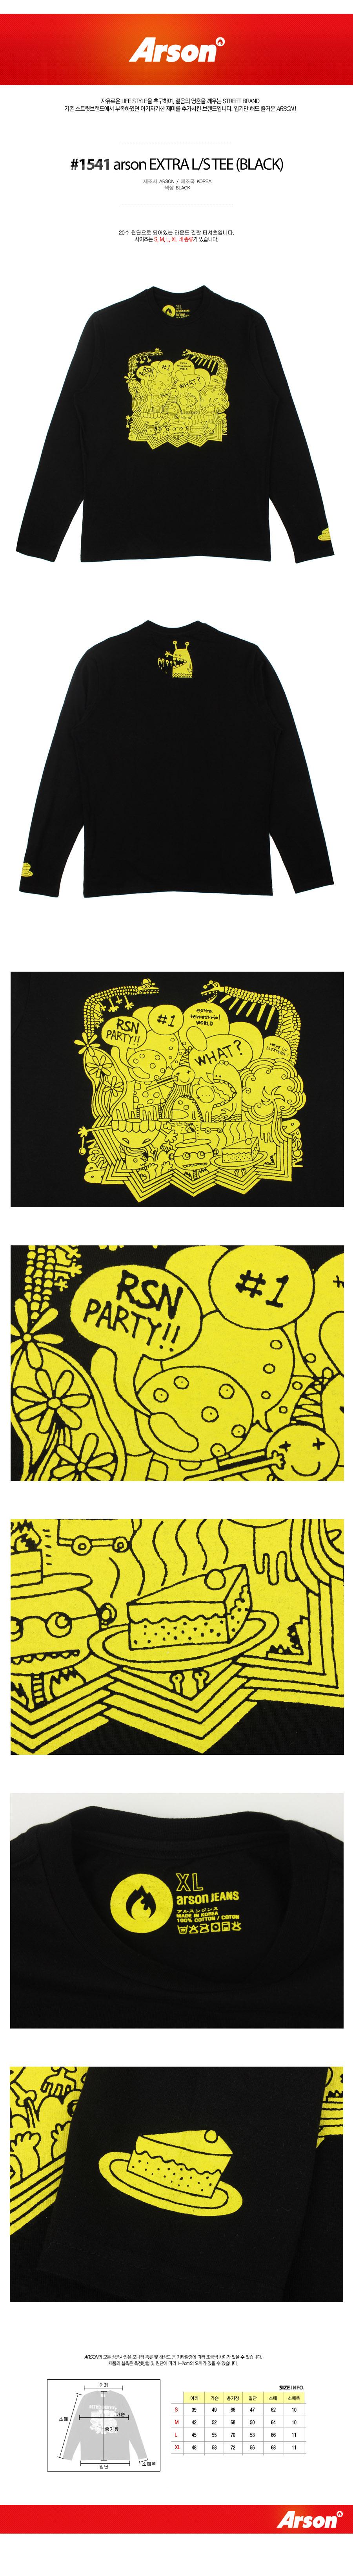 [ ARSON ] [ARSON] 1541 EXTRA longsleeved tshirt